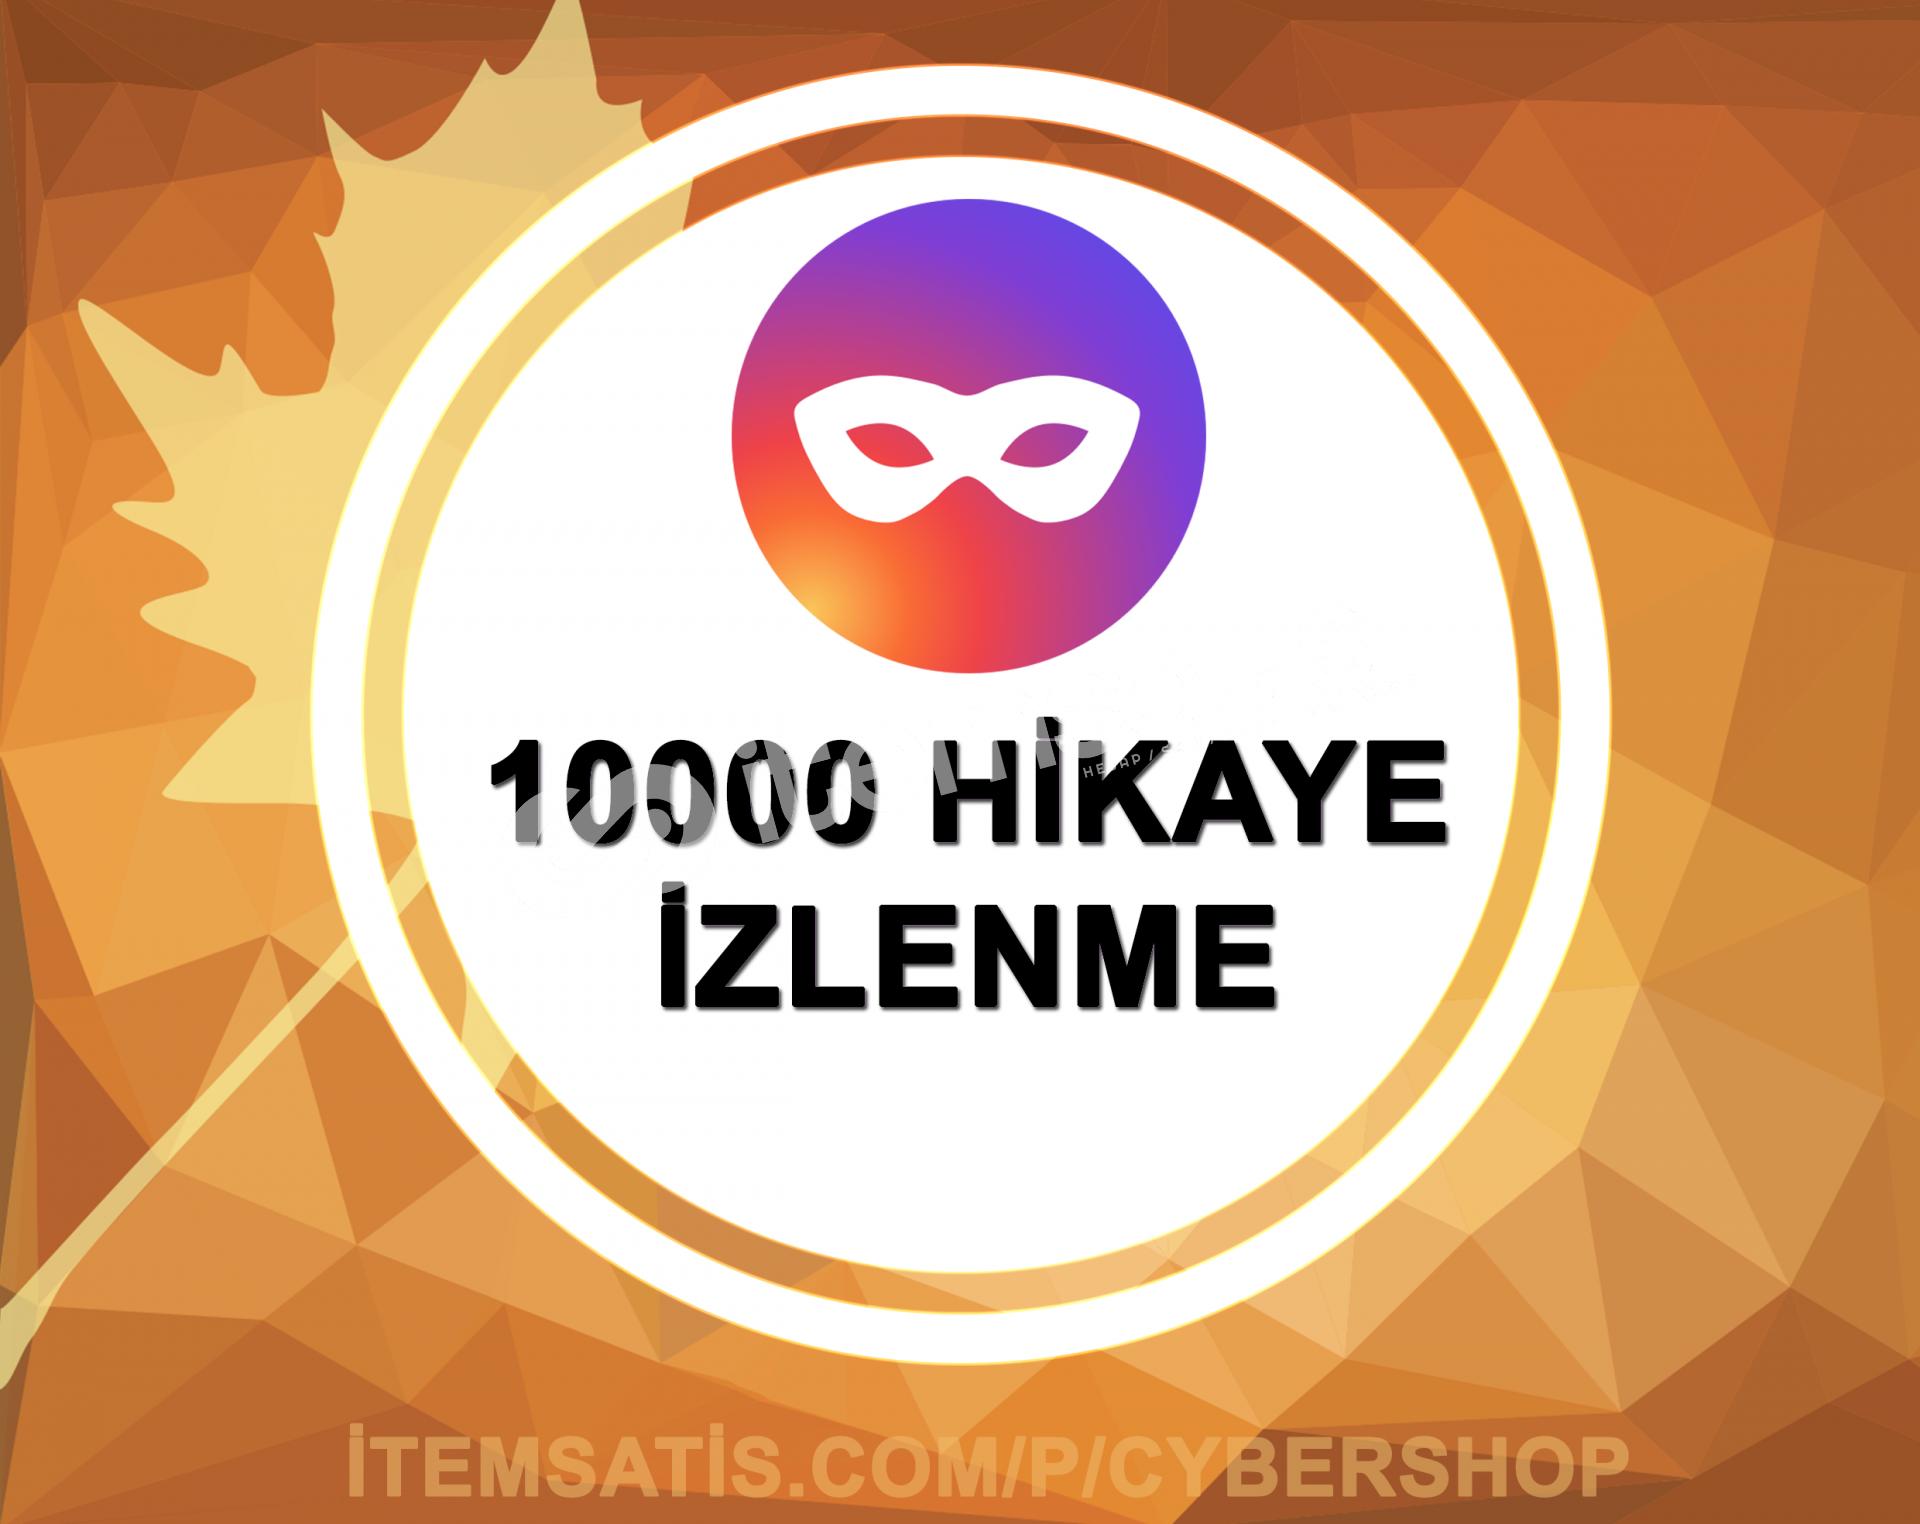 10000 Hikaye İzlenme (Tüm Hikayeler)